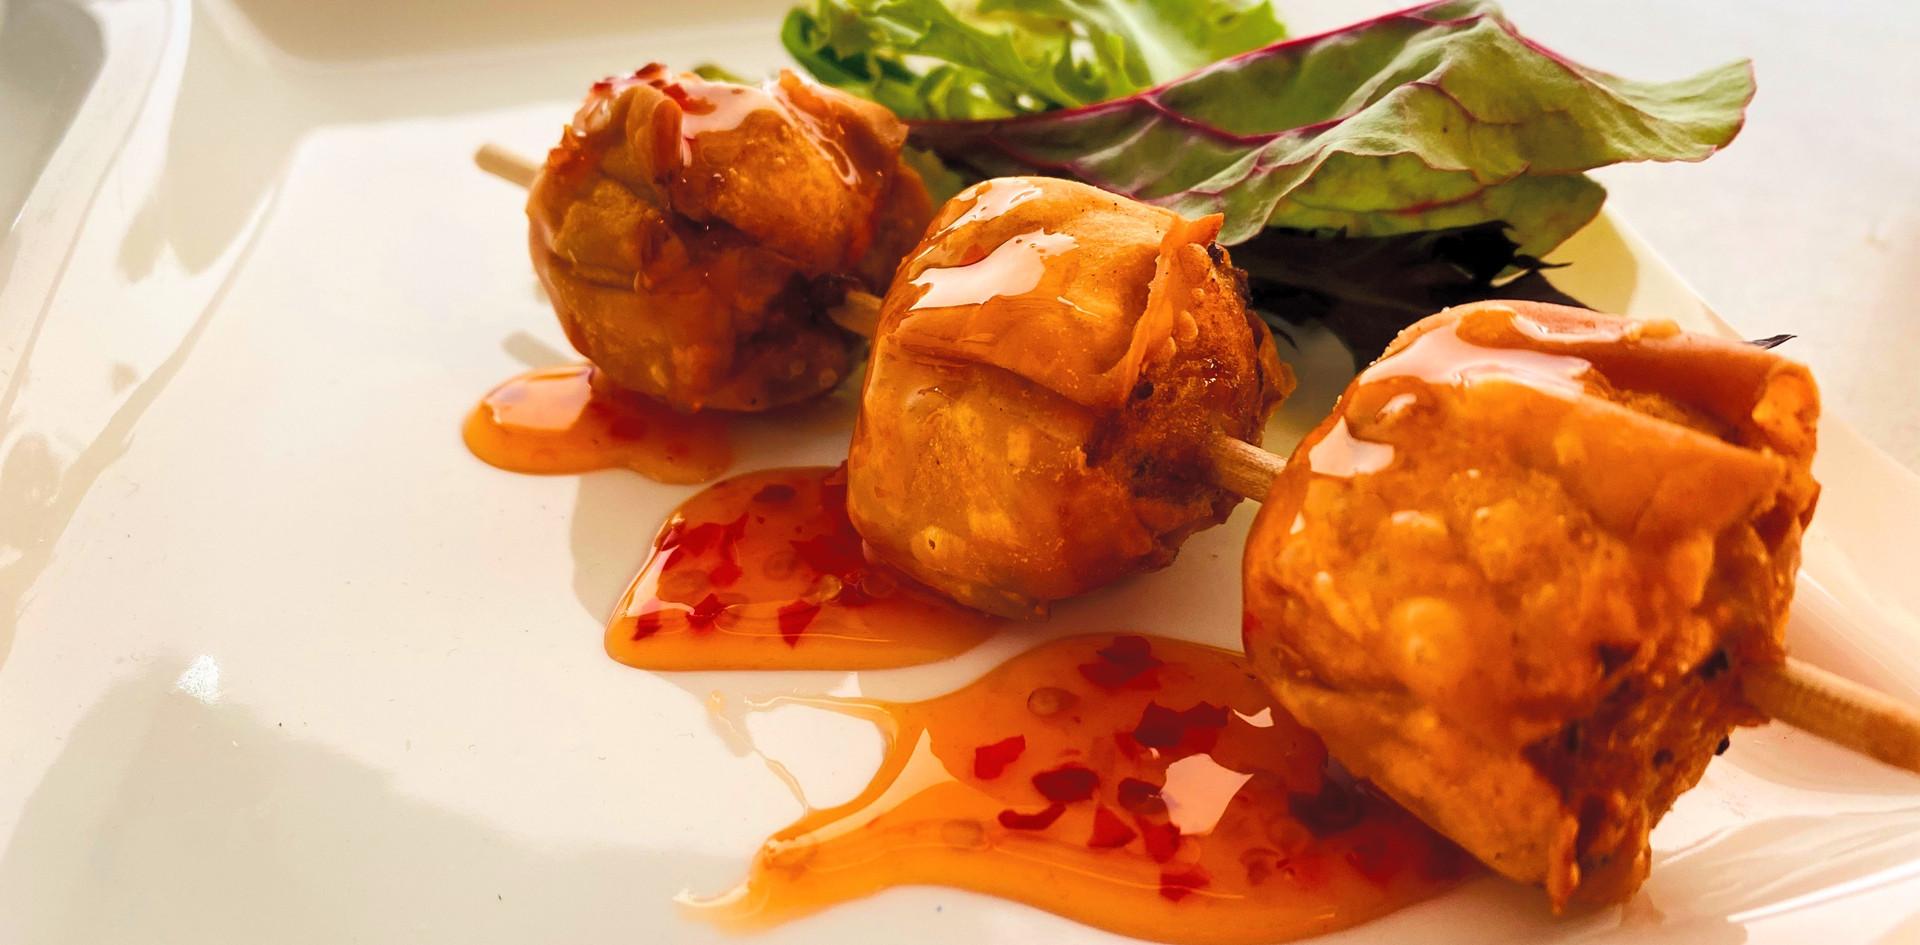 Fritert dumplings